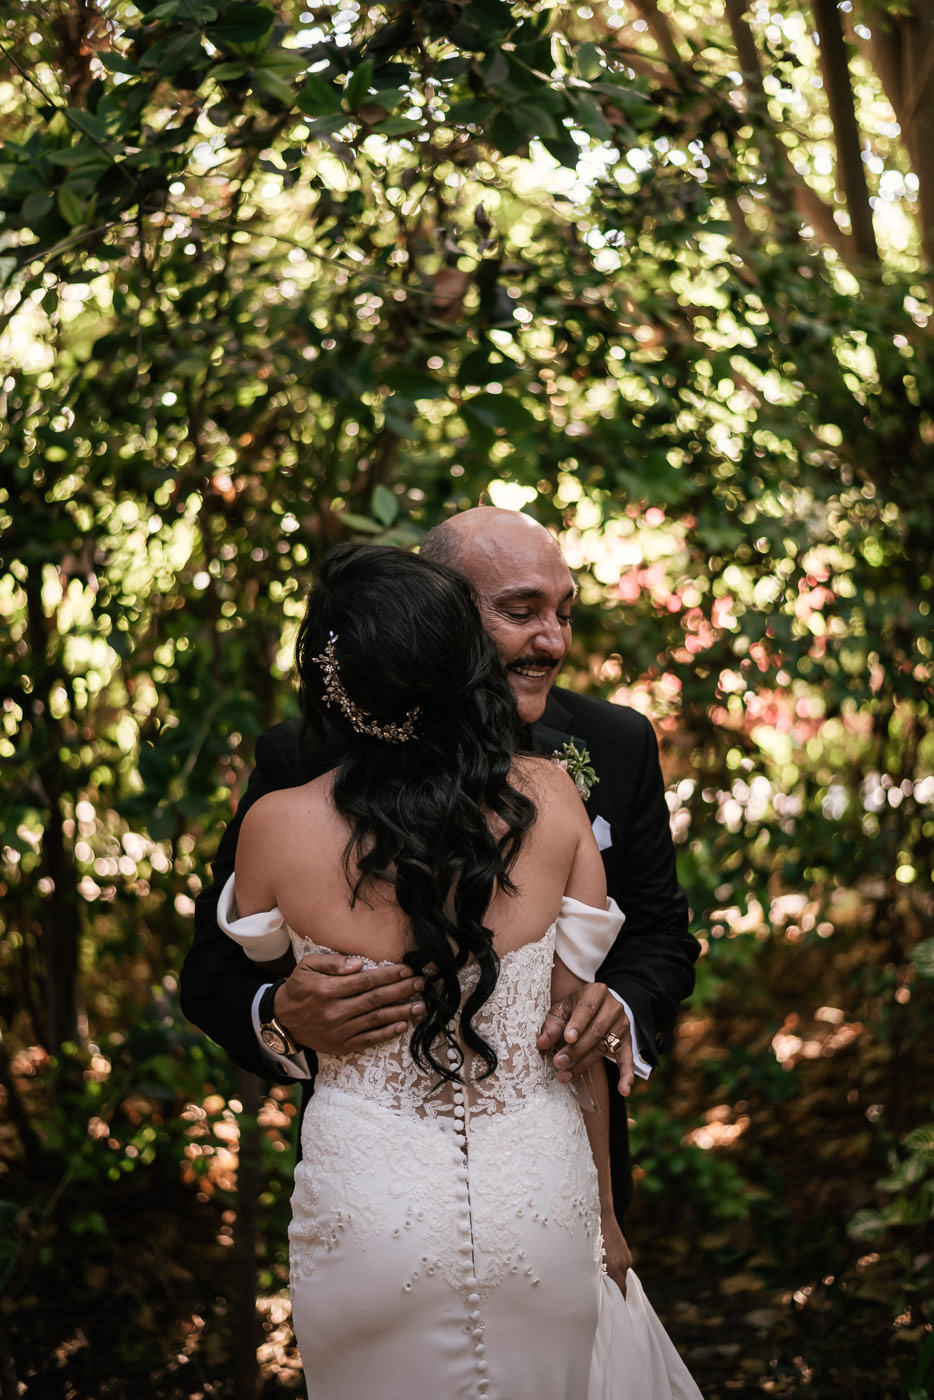 eden-gardens-wedding-photographer-romantic-12.jpg